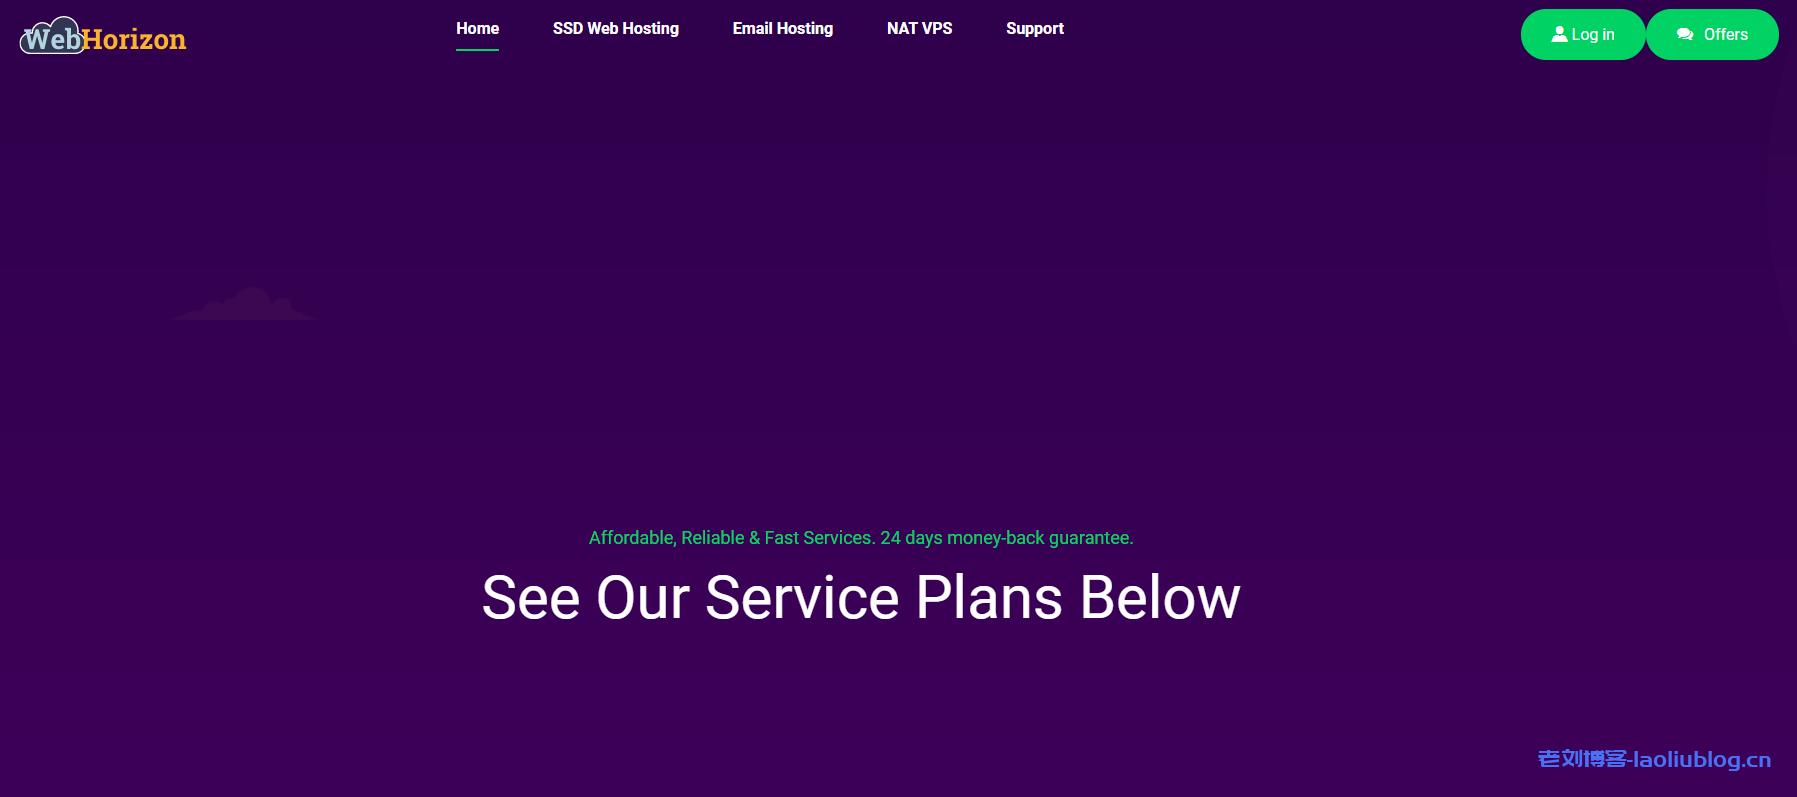 WebHorizon新加坡VPS八折优惠:免费20Gbps DDoS防御,$4.8/月/2GB/2核/25GB NVMe/250G月流量/1Gbps带宽